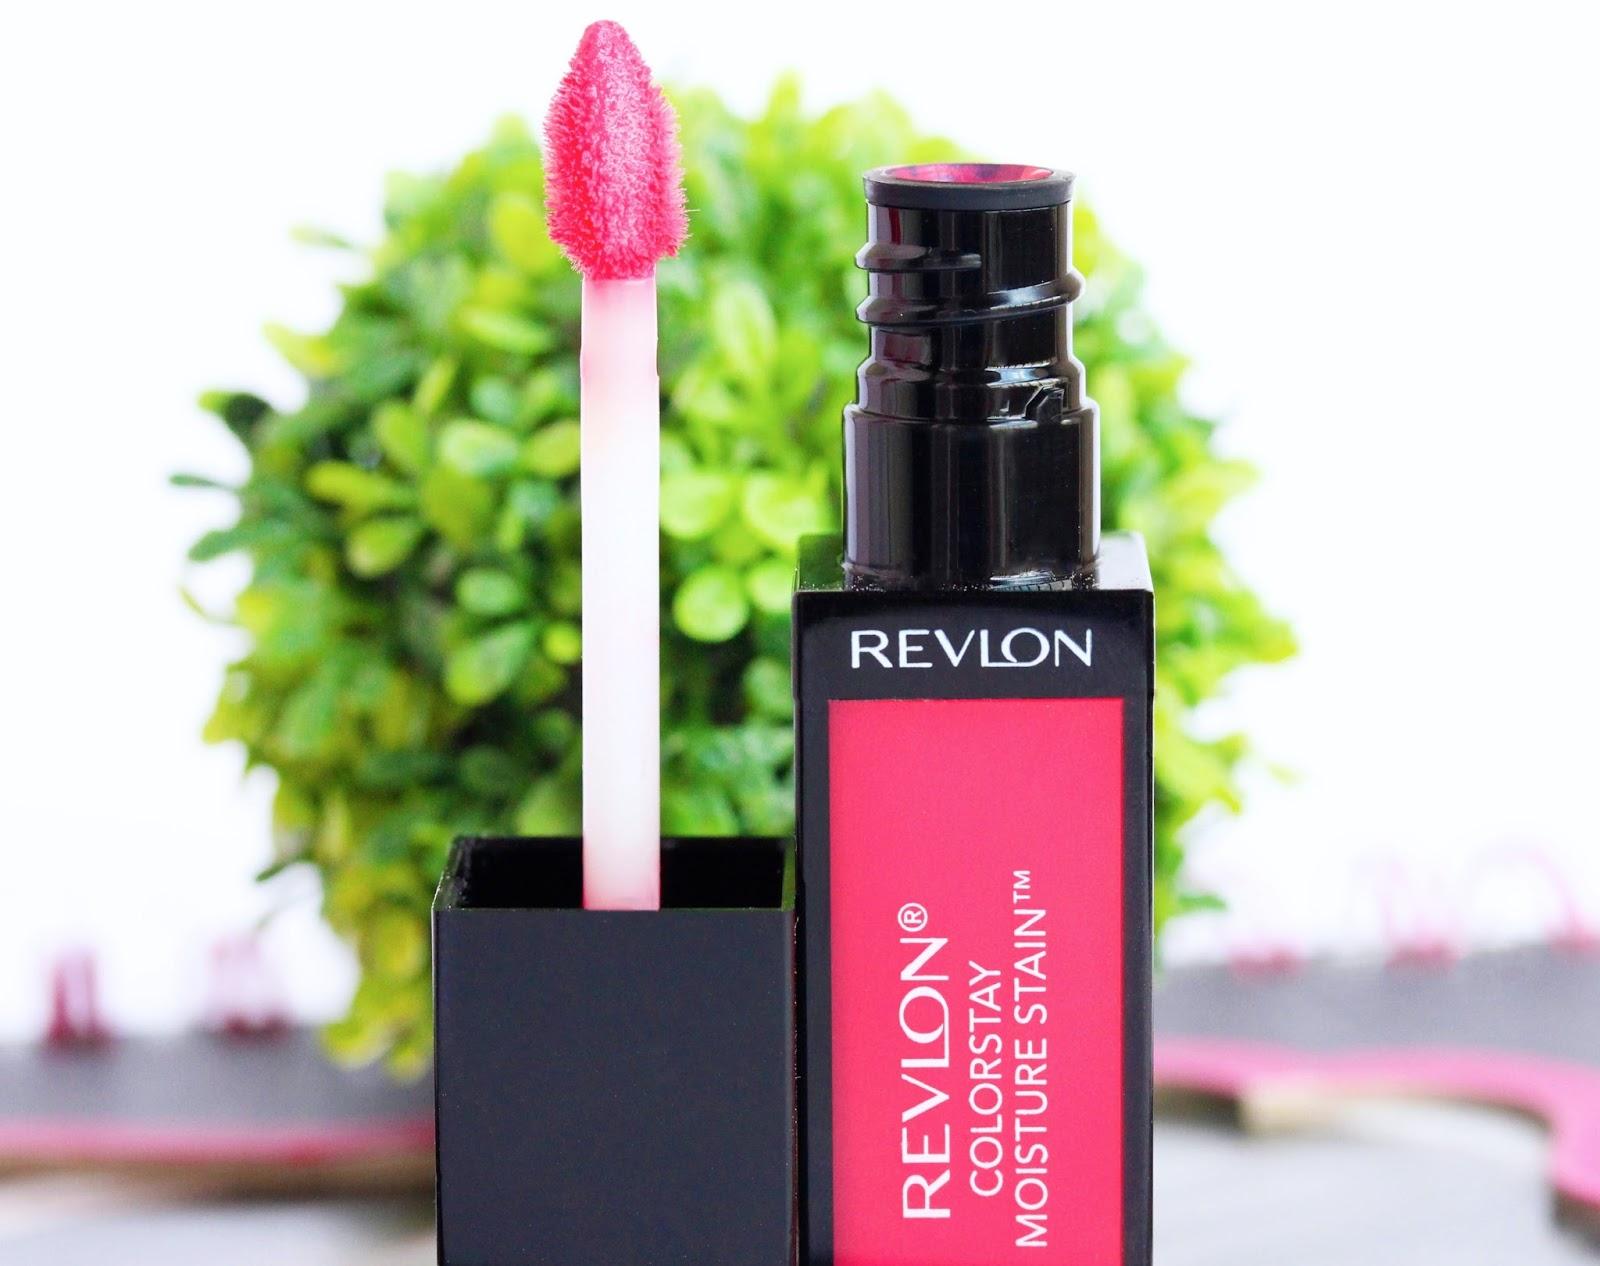 Revlon Colorstay Moisture Stay in Rio Rush